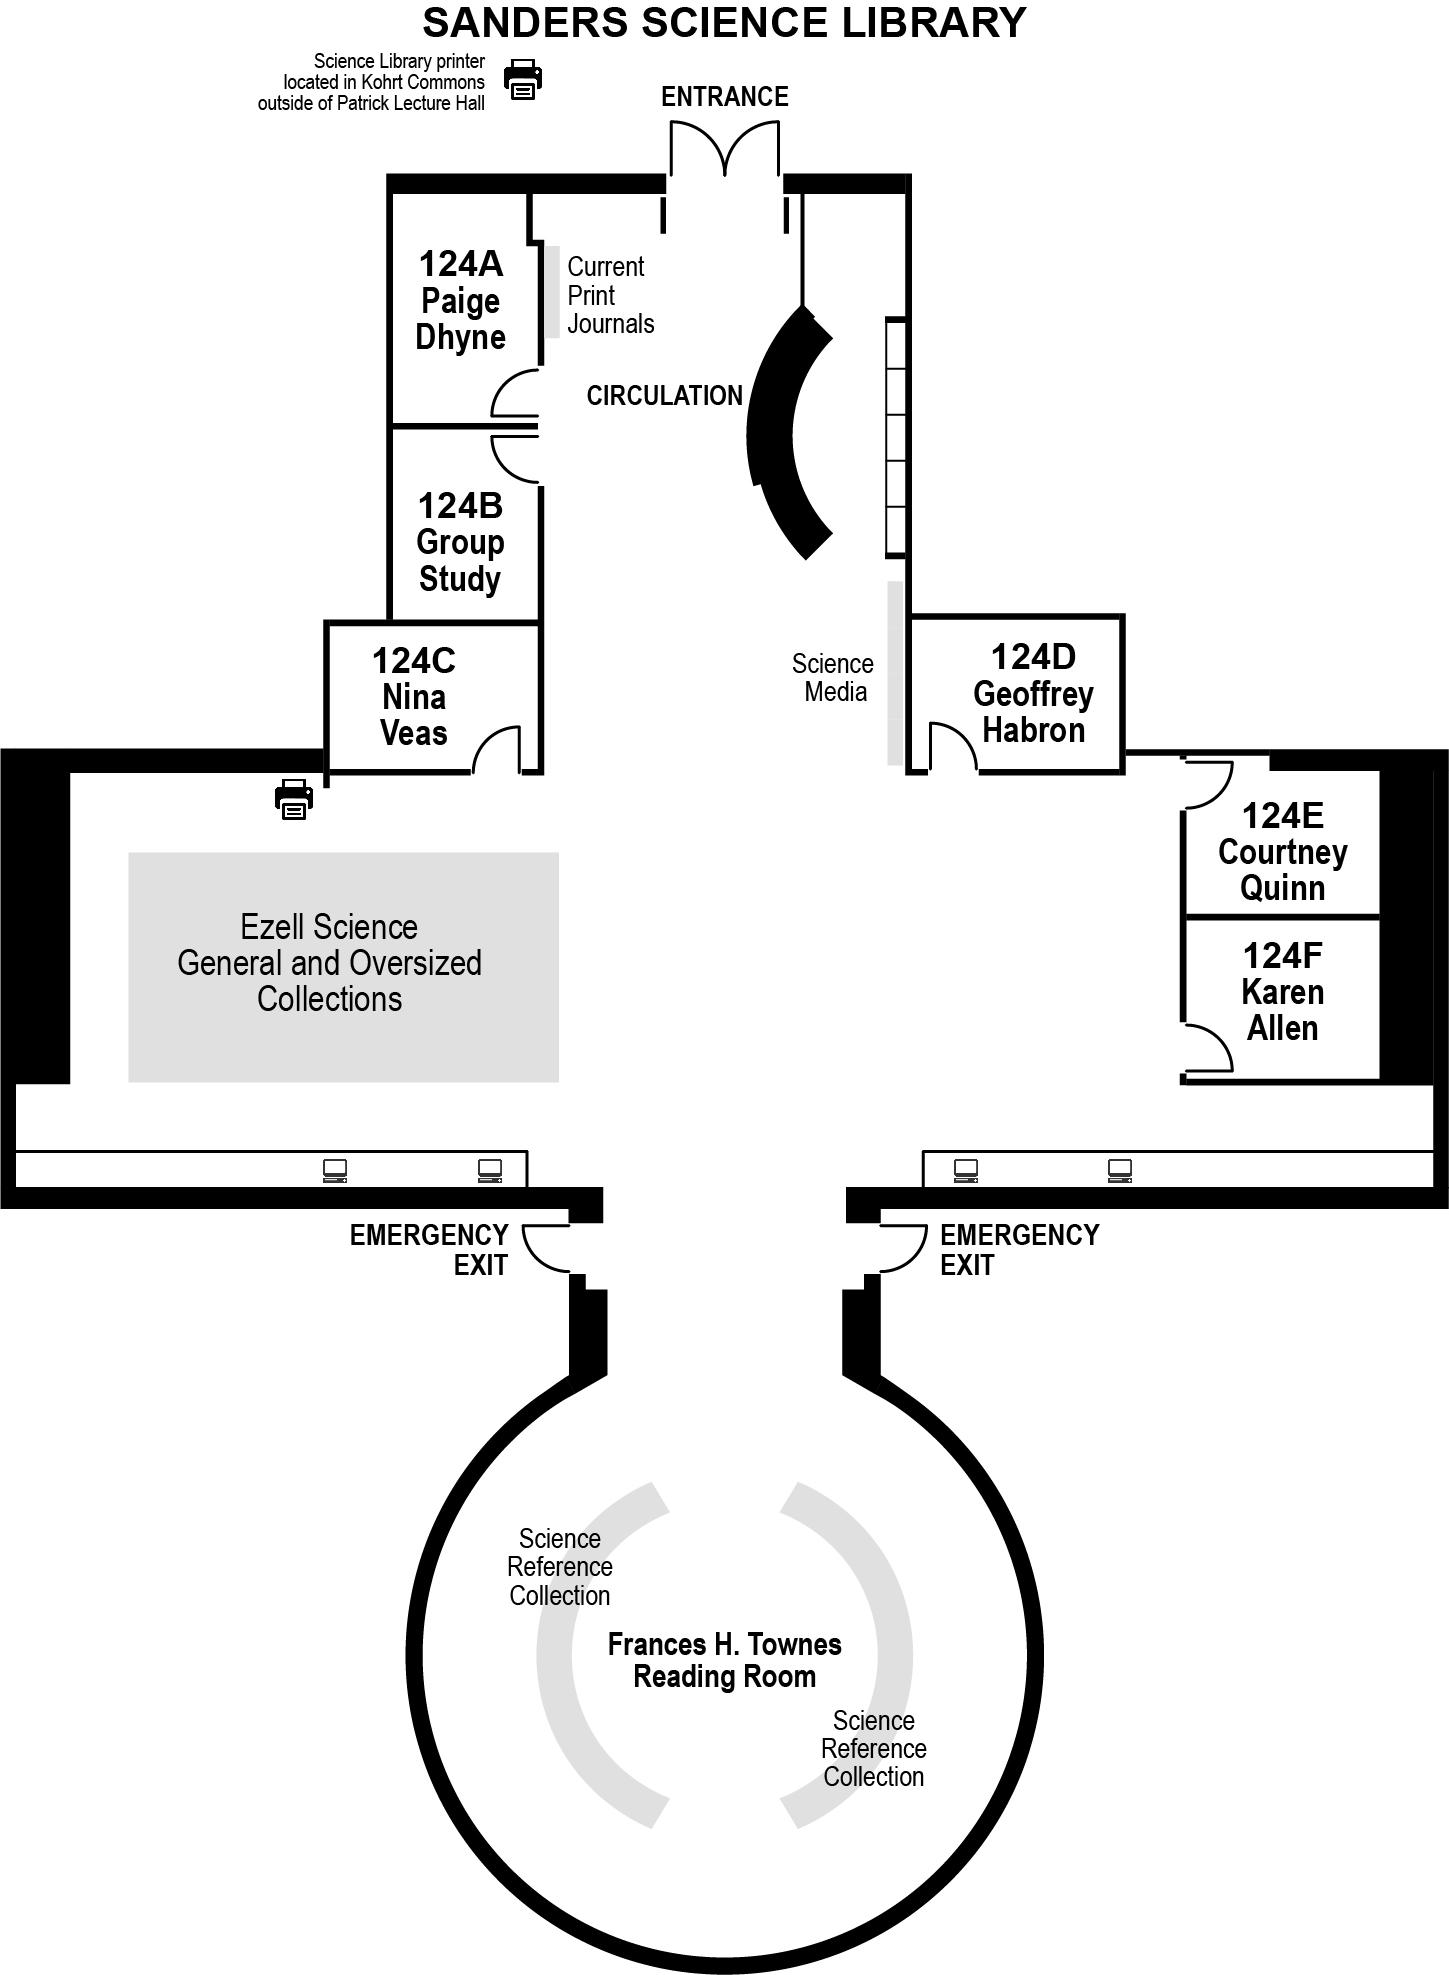 Science Library Floor Plan